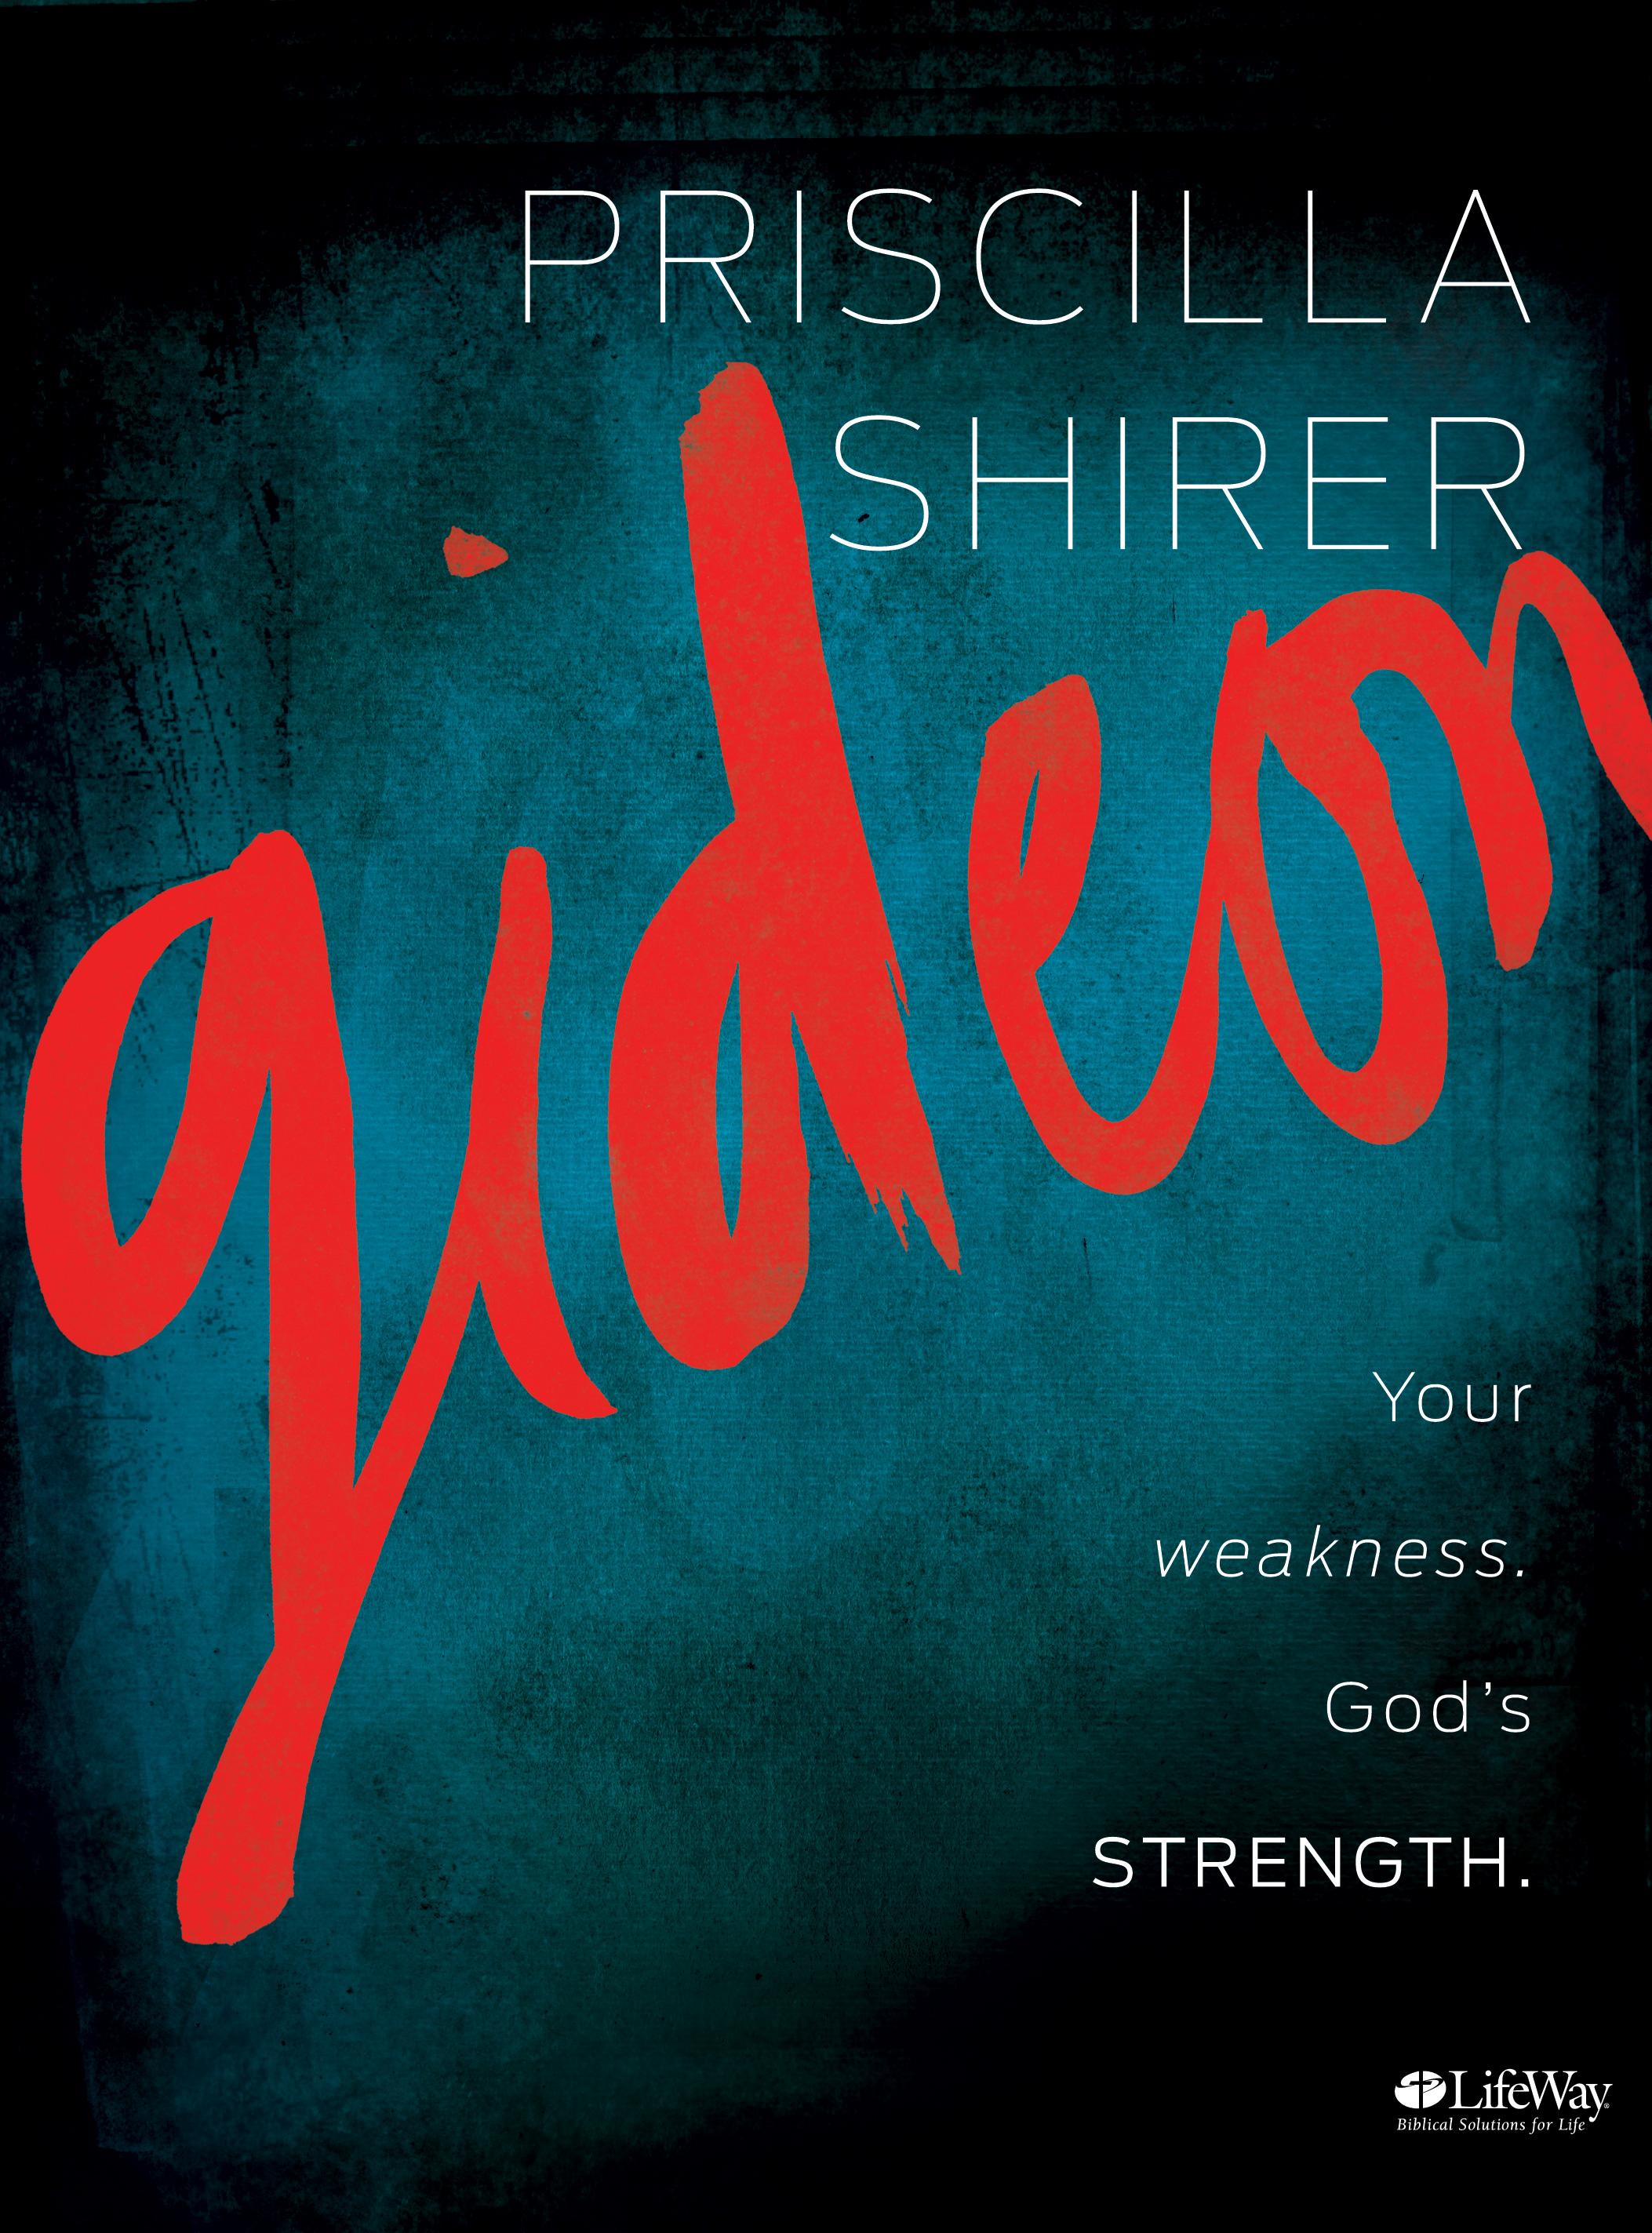 Gideon Leader Kit